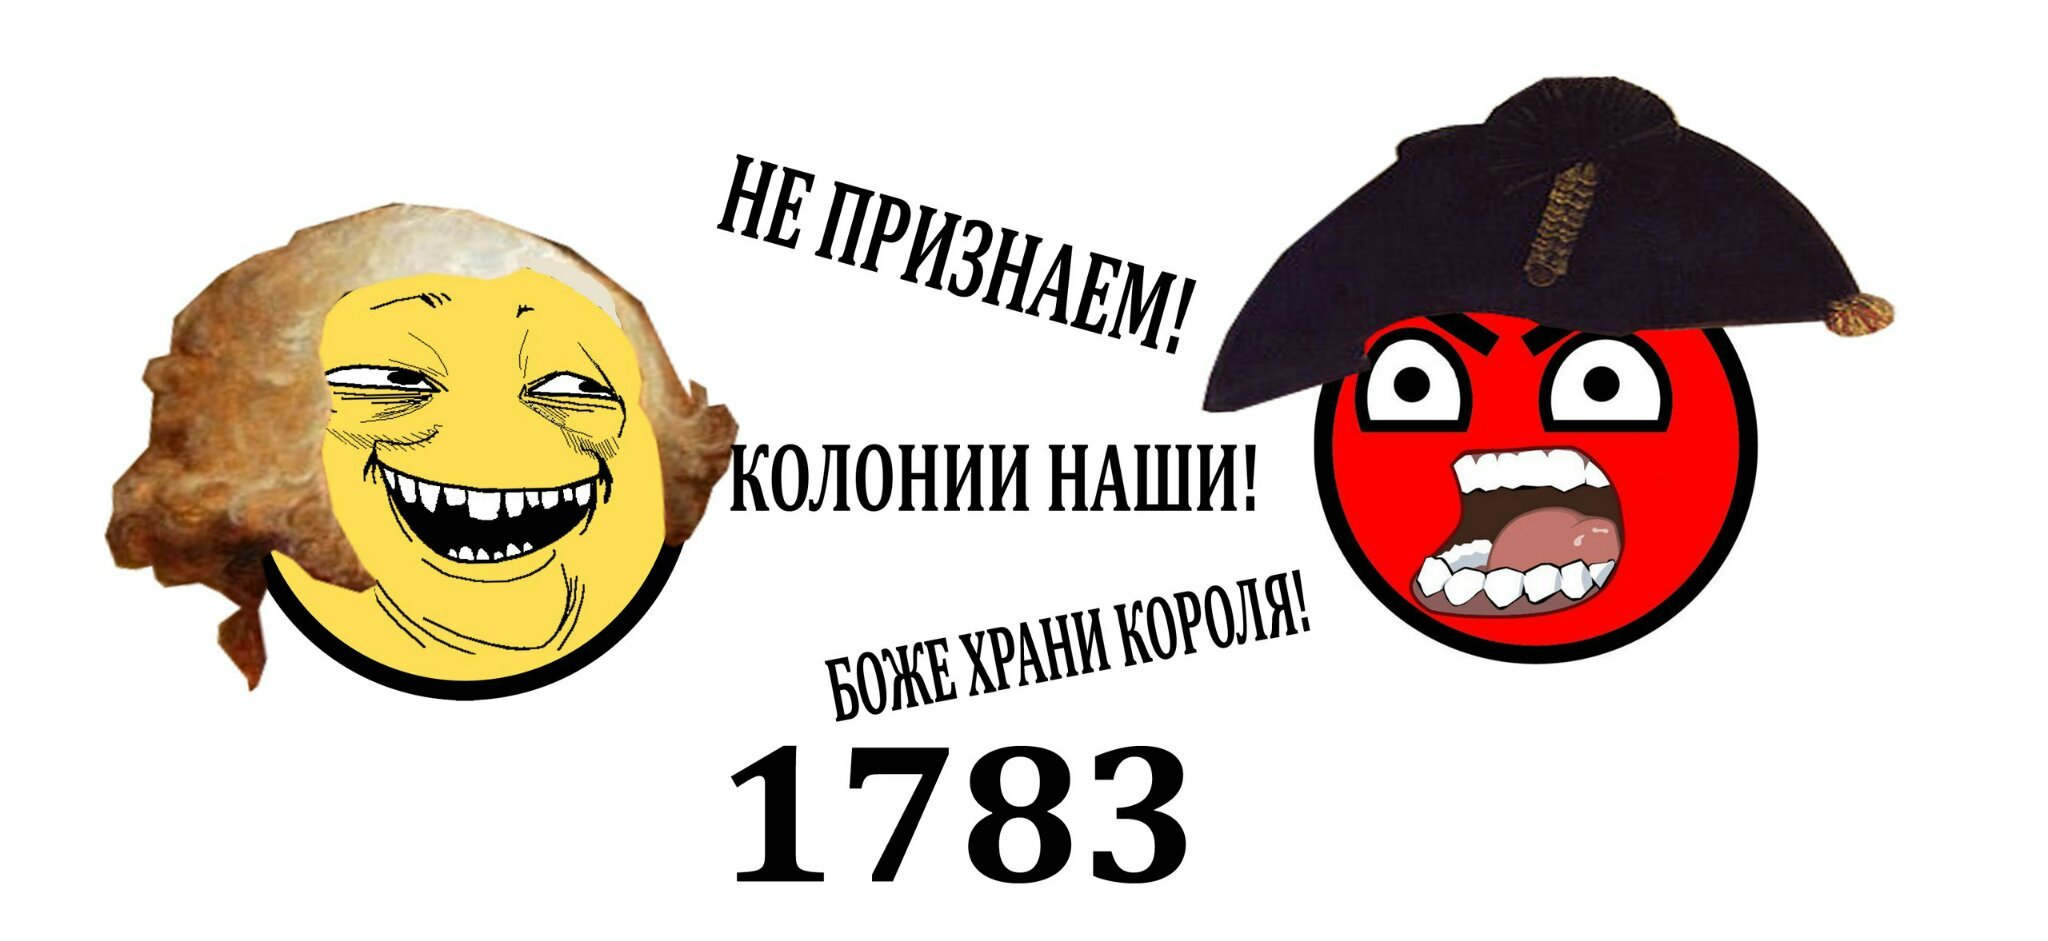 1783 - meme